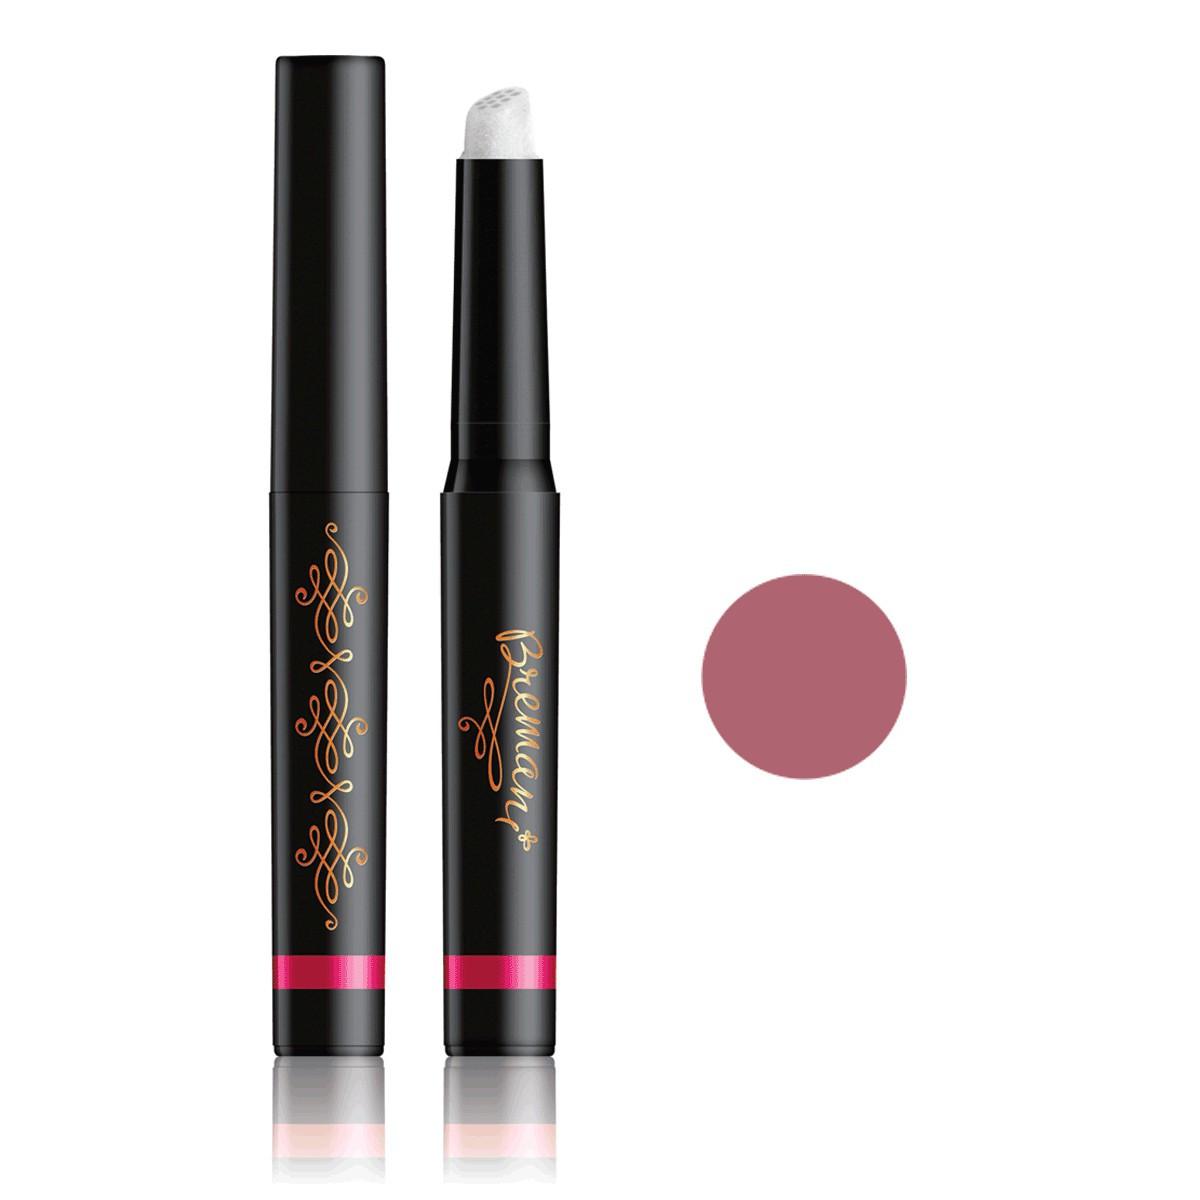 "New!Lipstick Peony Новинка!Помада ""Пион"" с фибровым аппликатором, Bremani, NSP, Бремани, НСП, Италия."